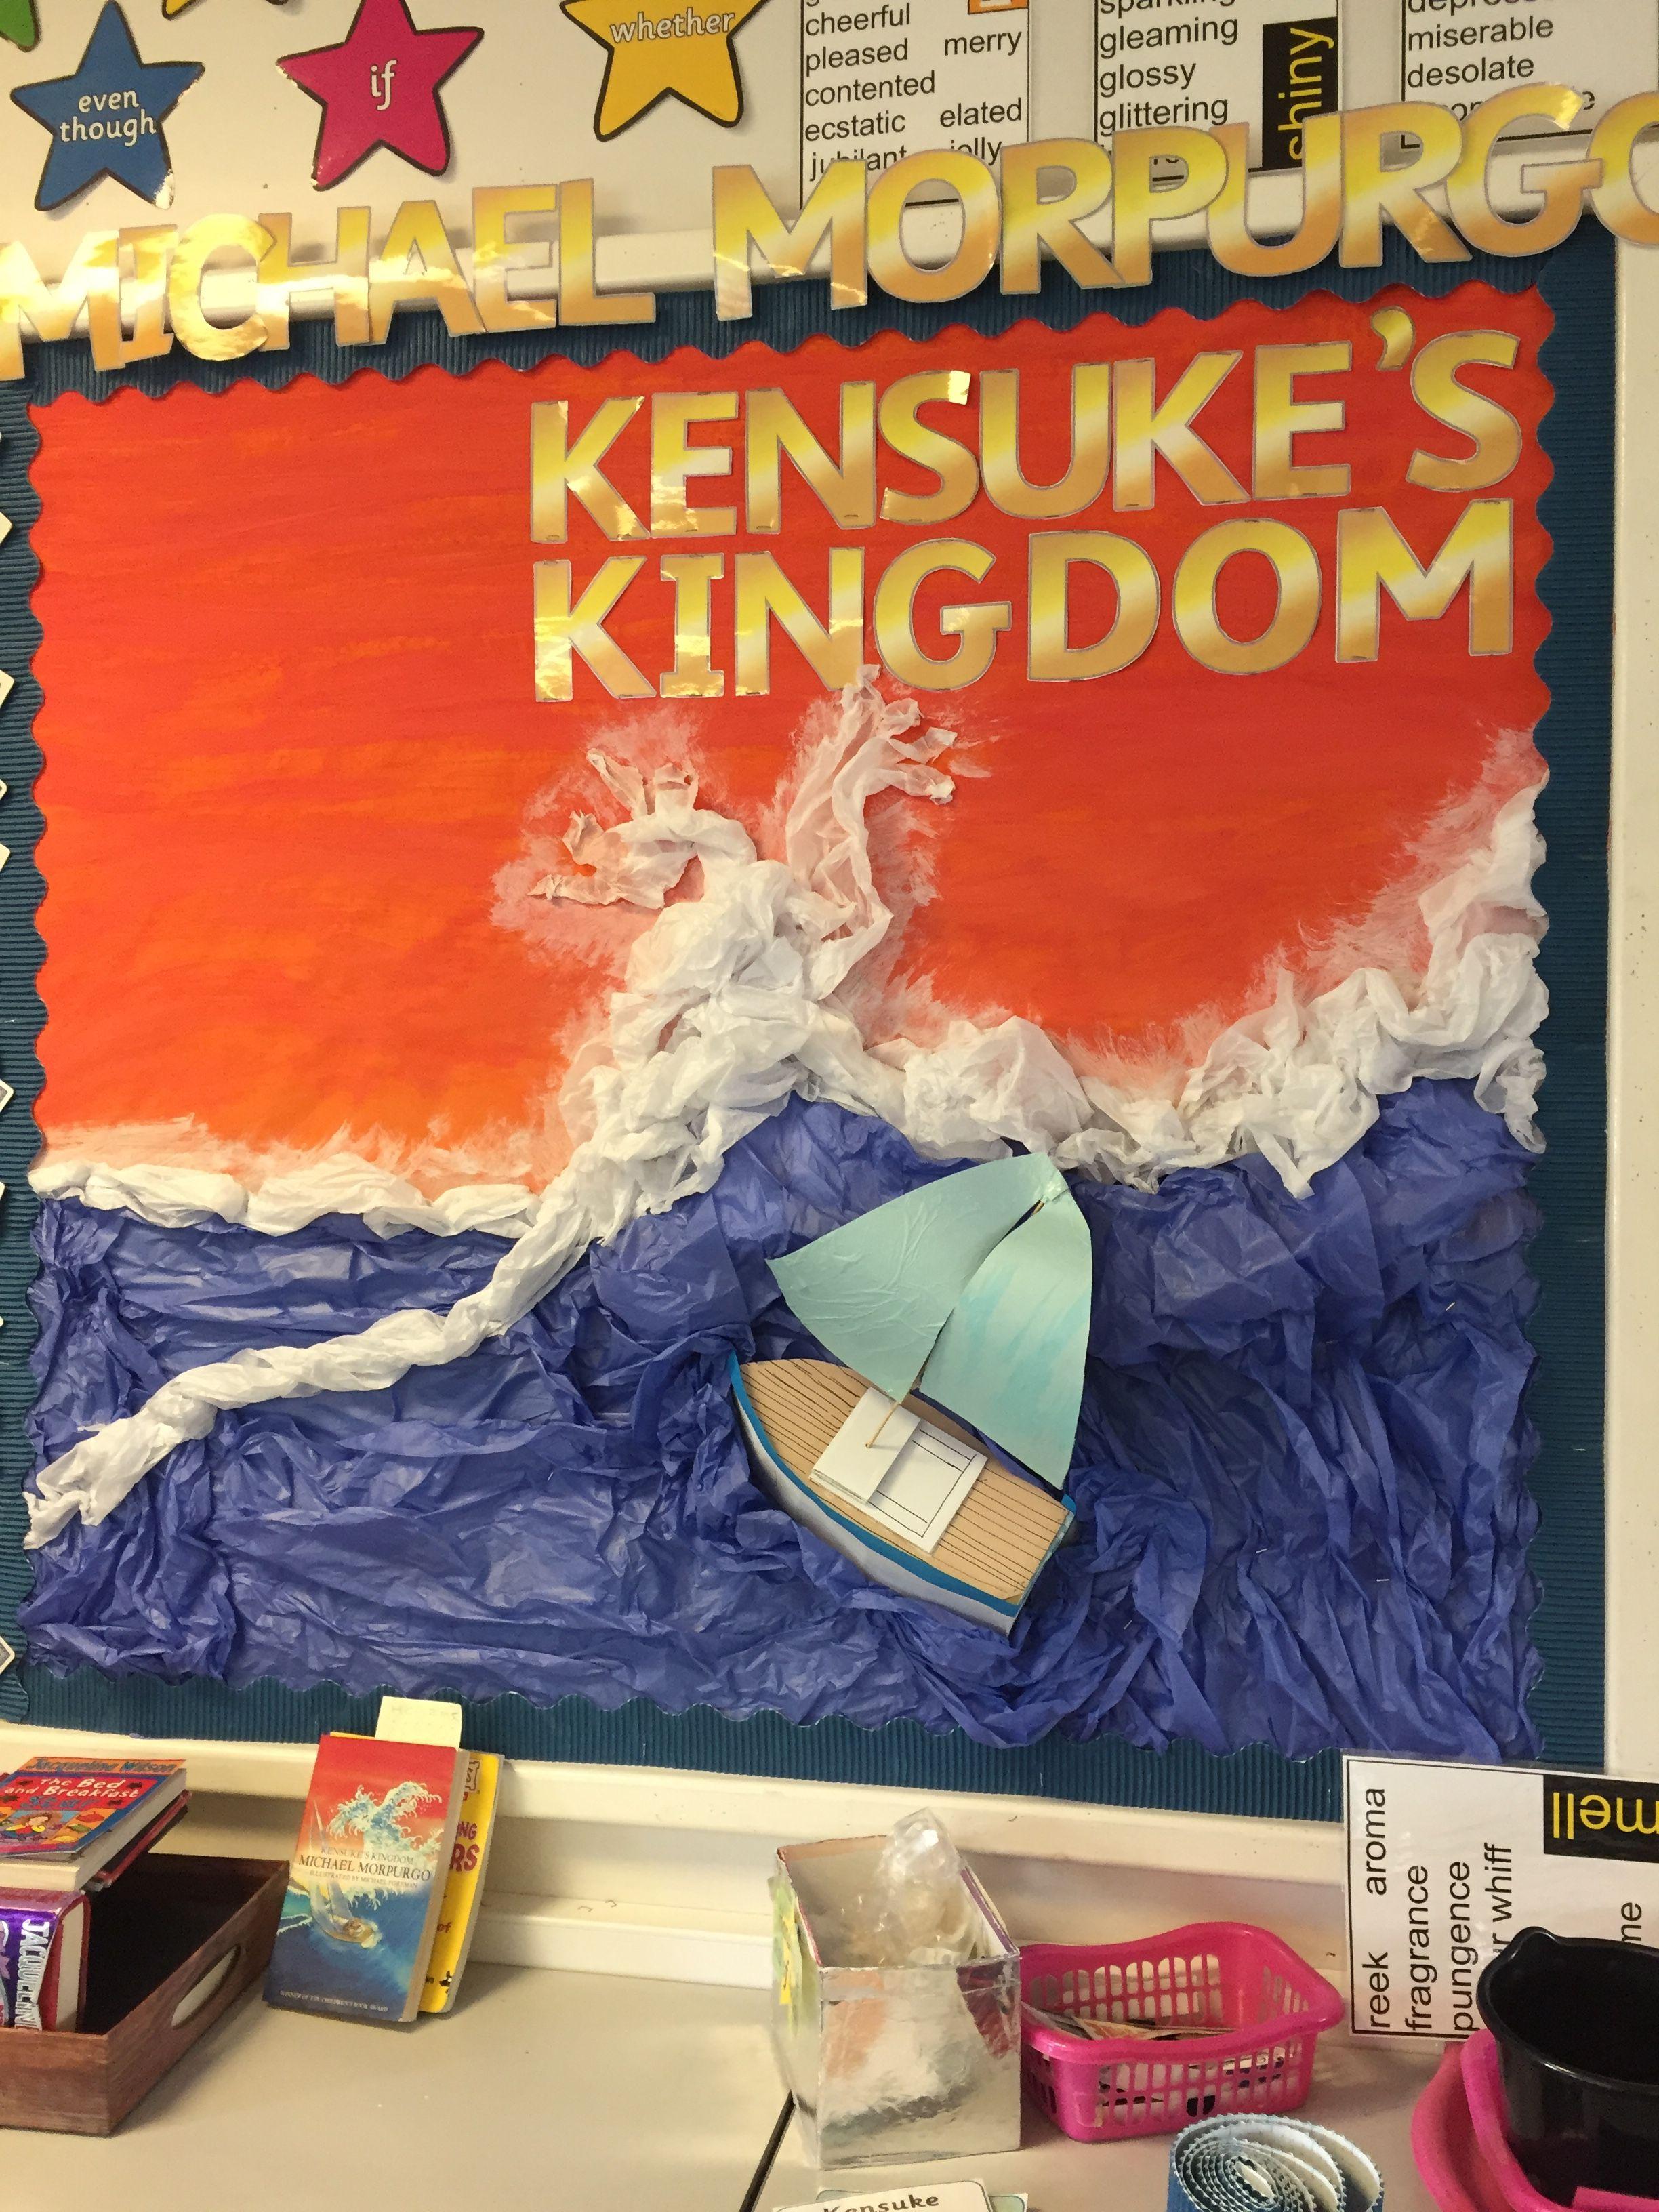 Kensukes Kingdom Michael Morpurgo 3d Display